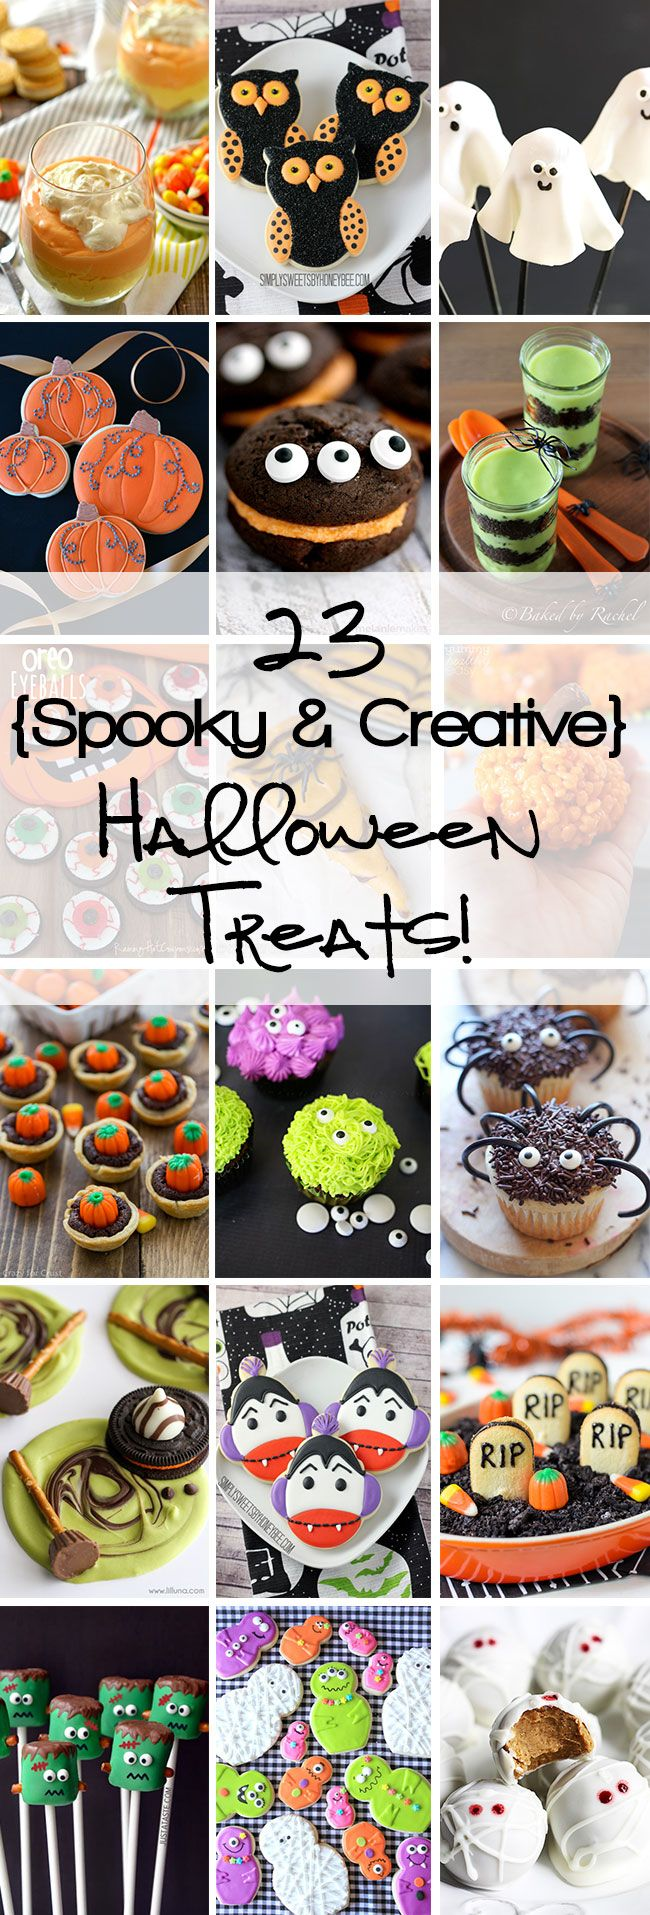 23 Spooky & Creative Halloween Treats!